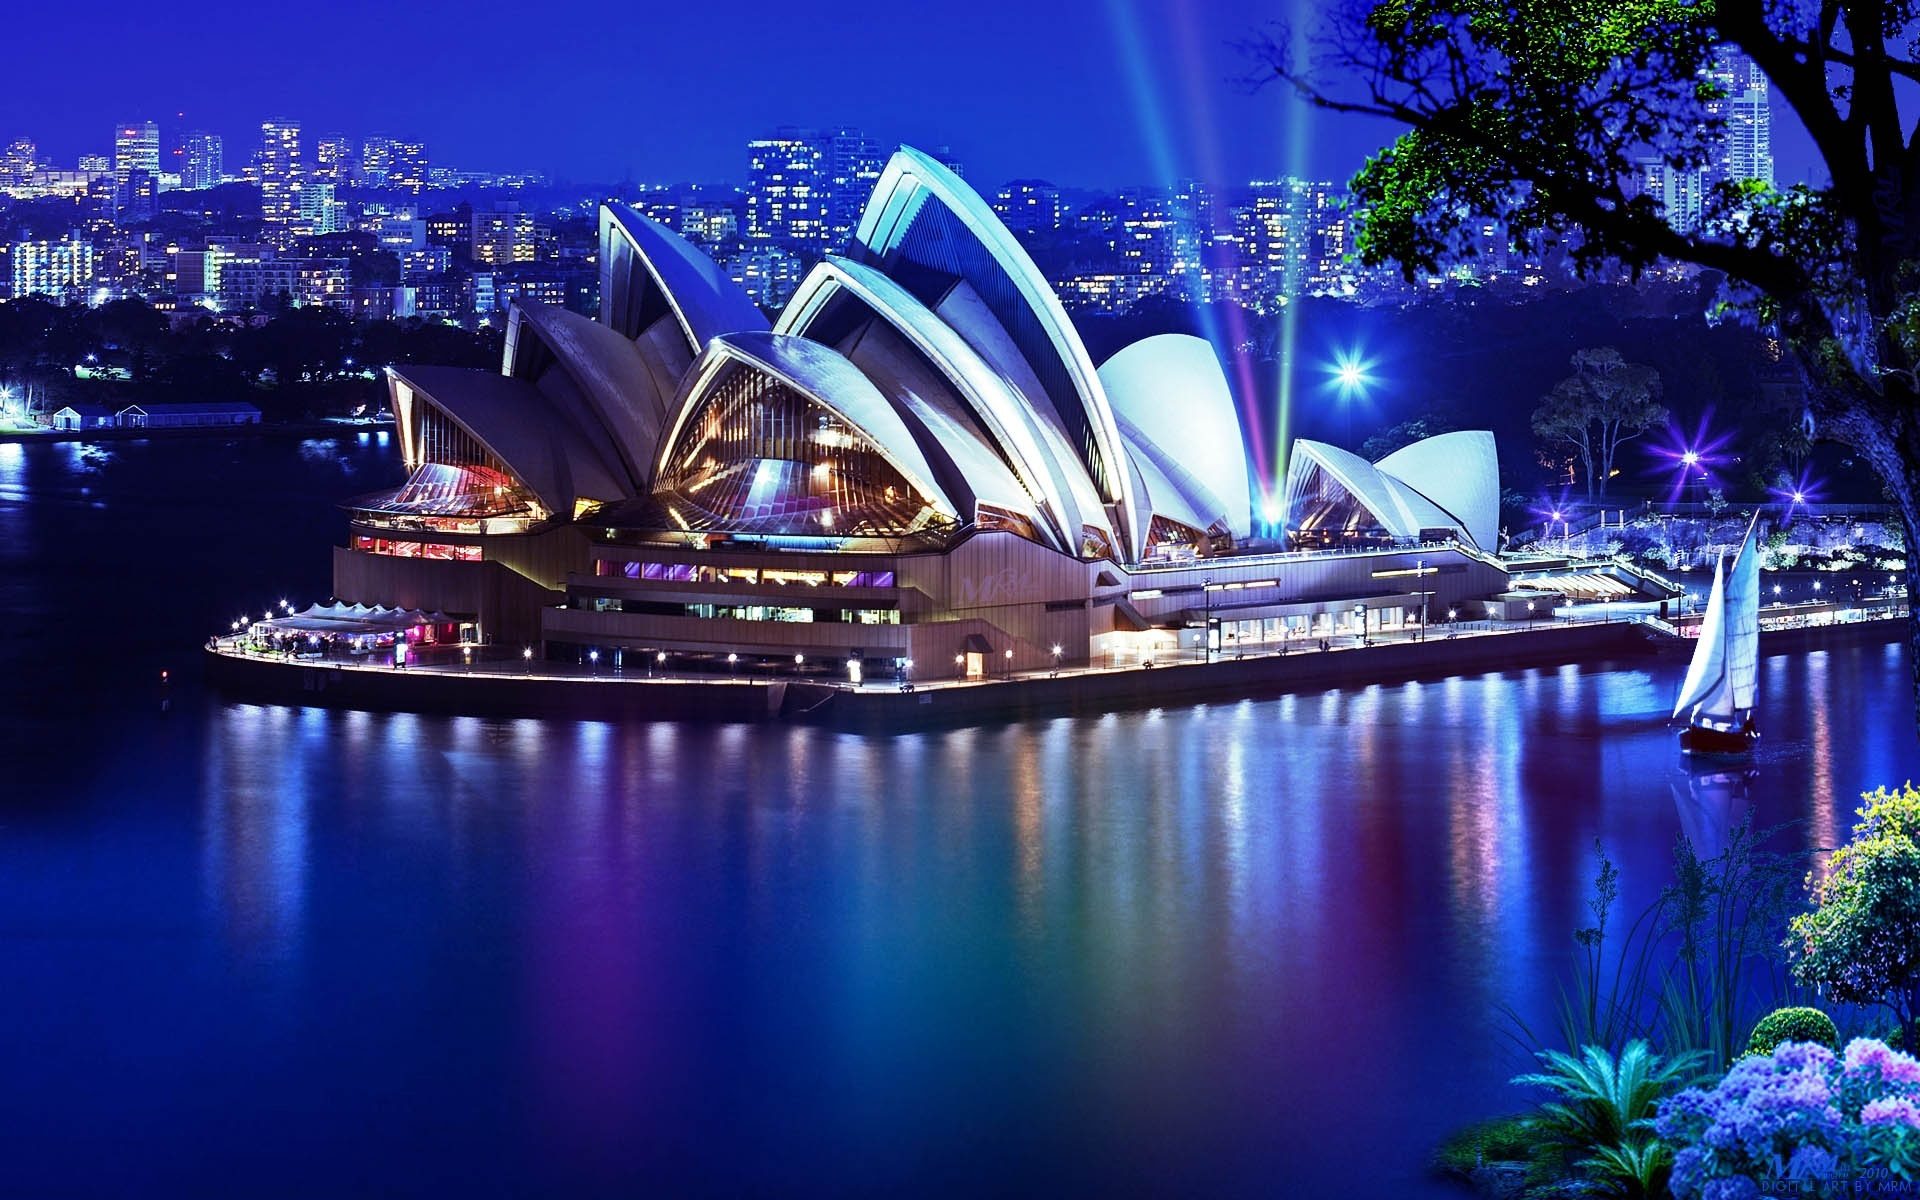 Sydney Opera House High Definition Wallpaper   HD Wallpapers 1920x1200